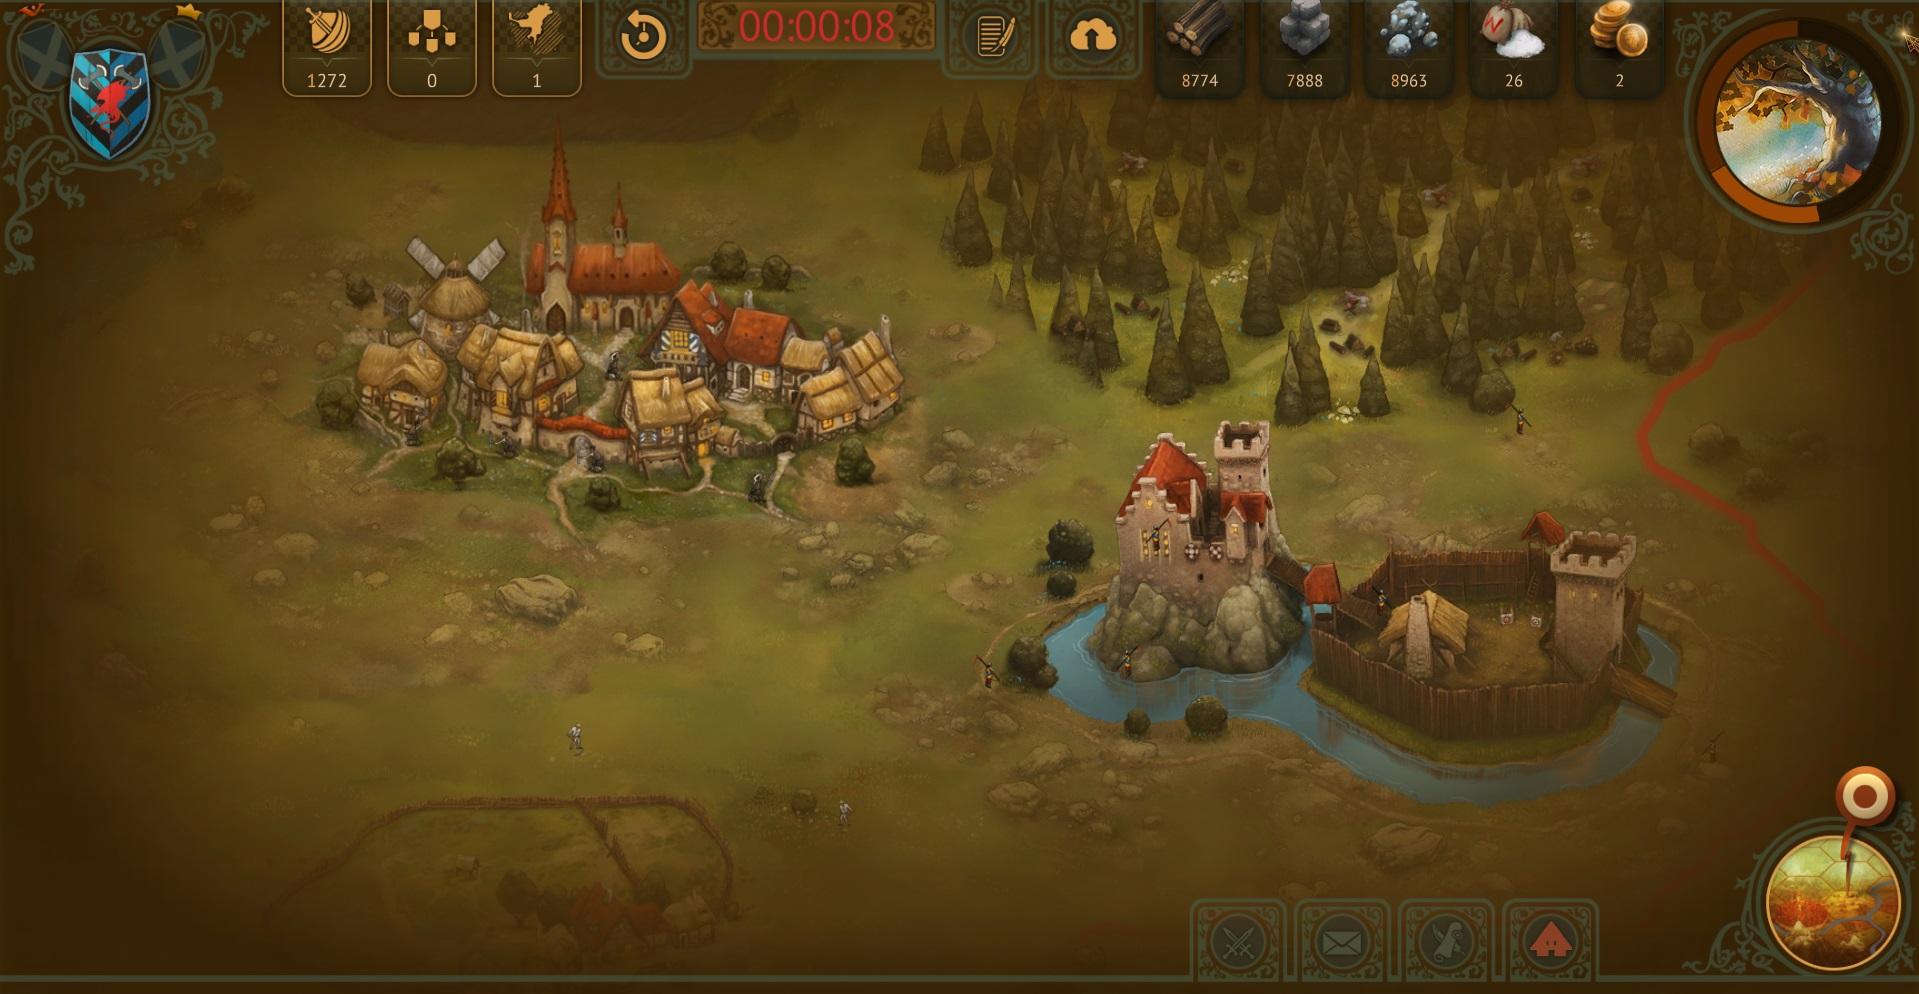 Village and lvl 2 castle 1